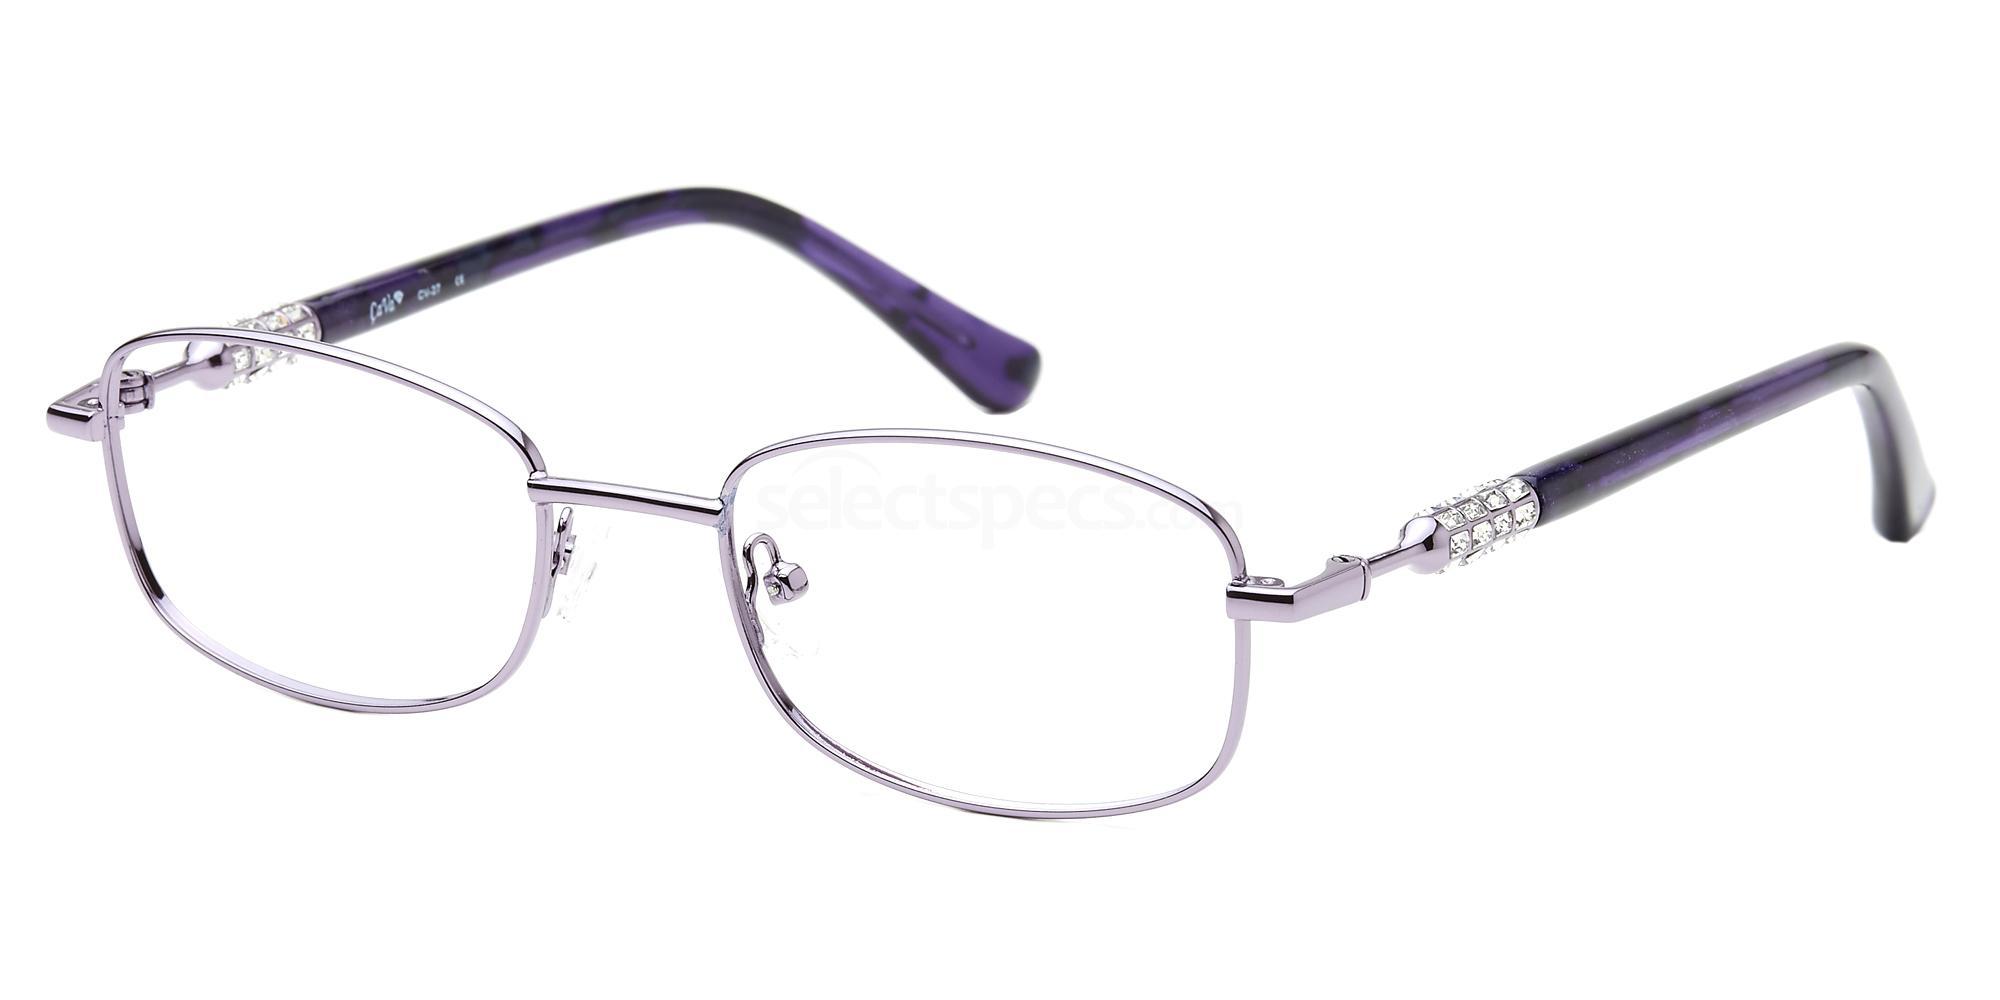 C1 CV27 Glasses, Ca Va